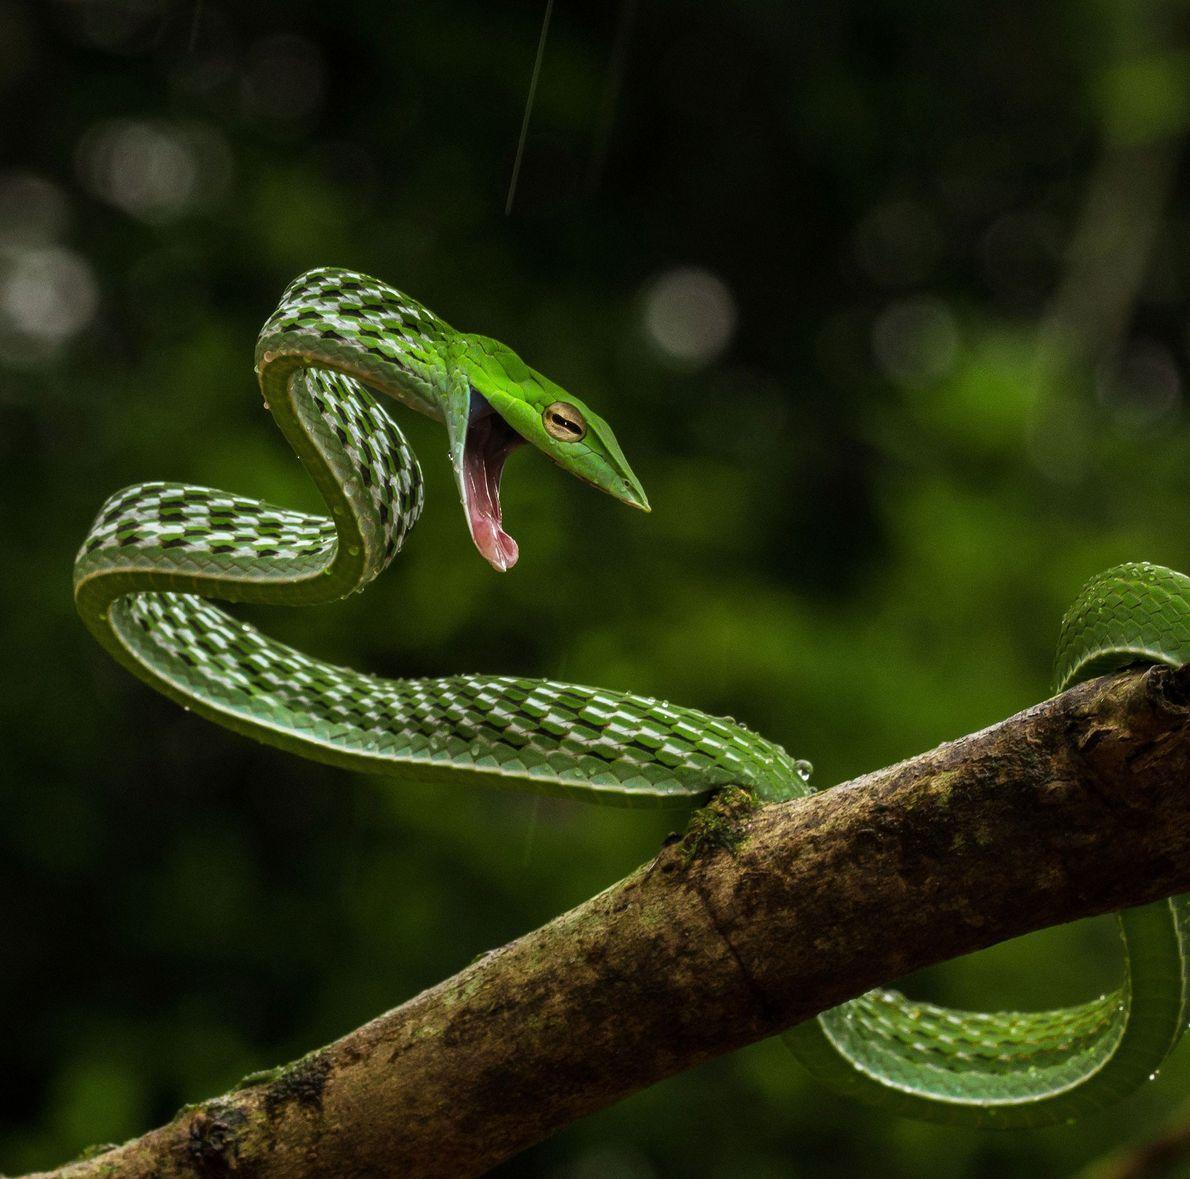 Green vine snake. Shimoga, Karnataka, India